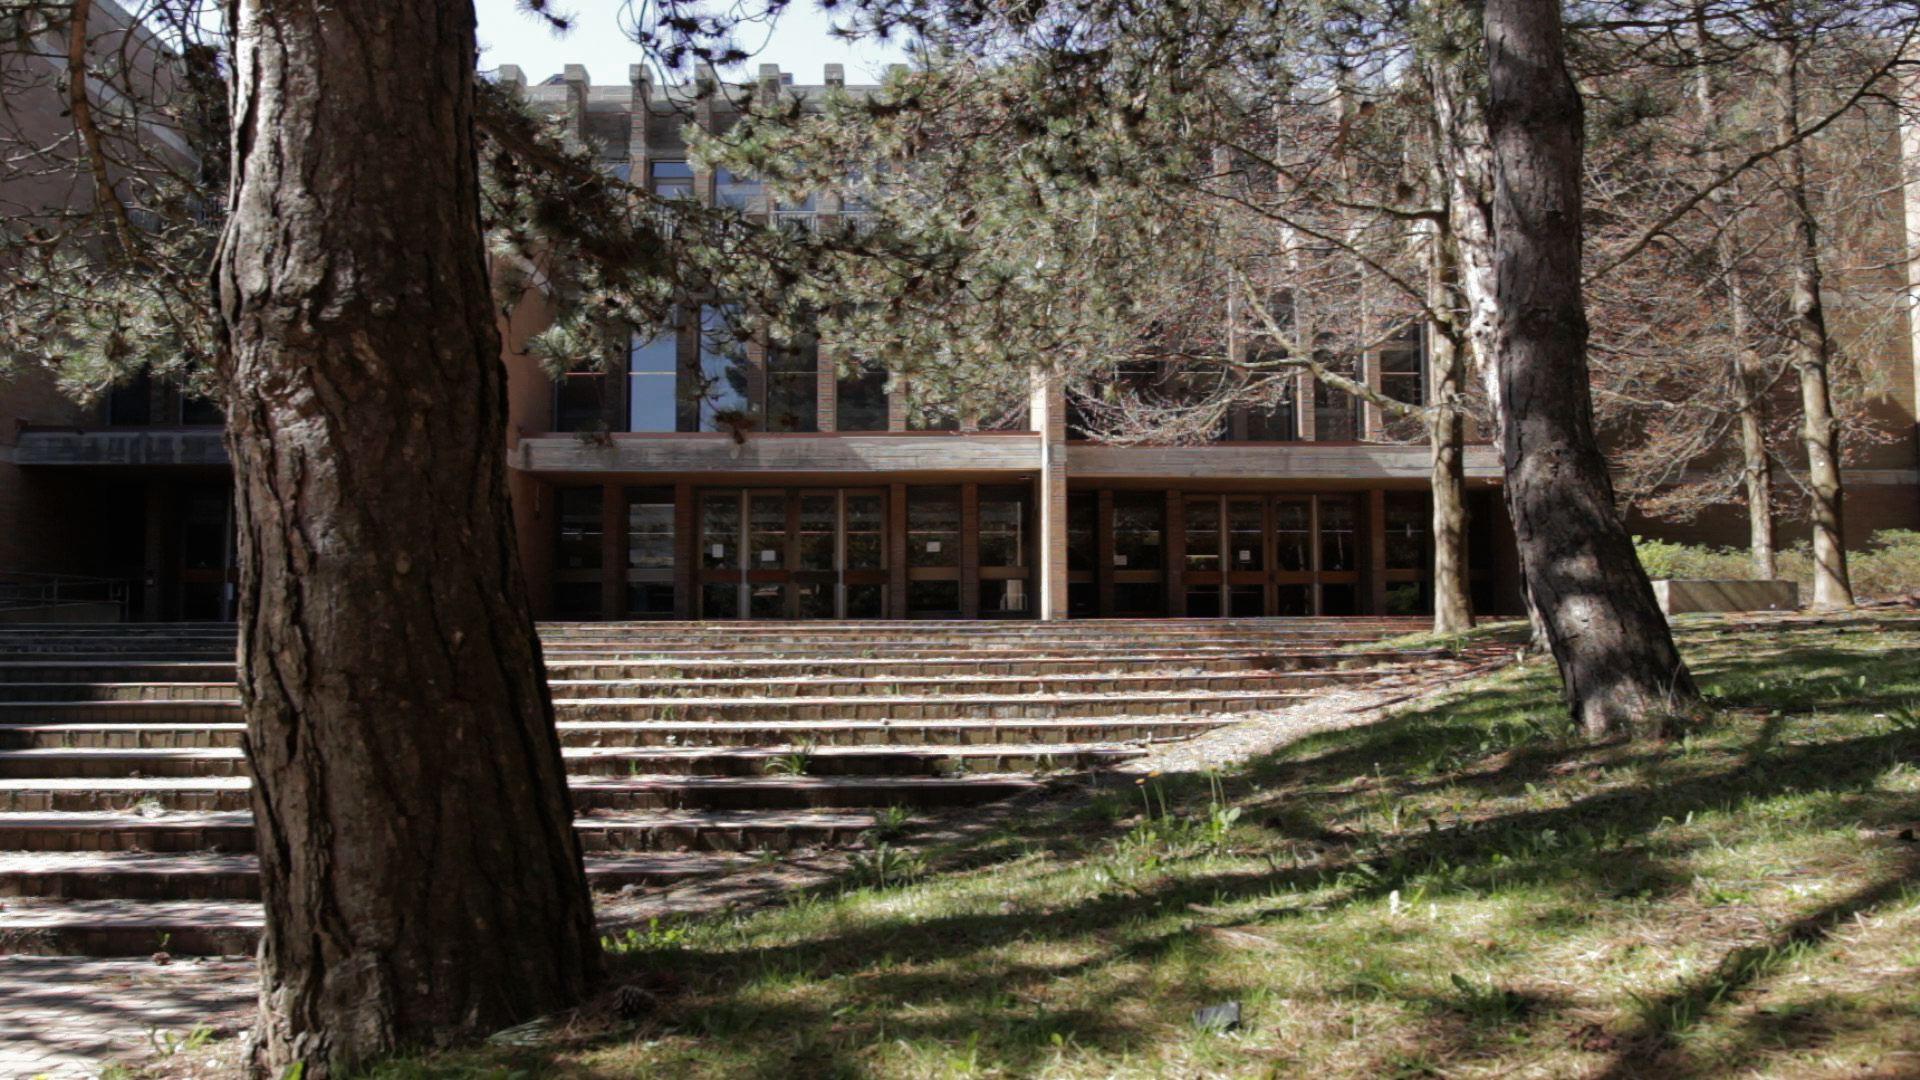 H.R. MacMillan Building